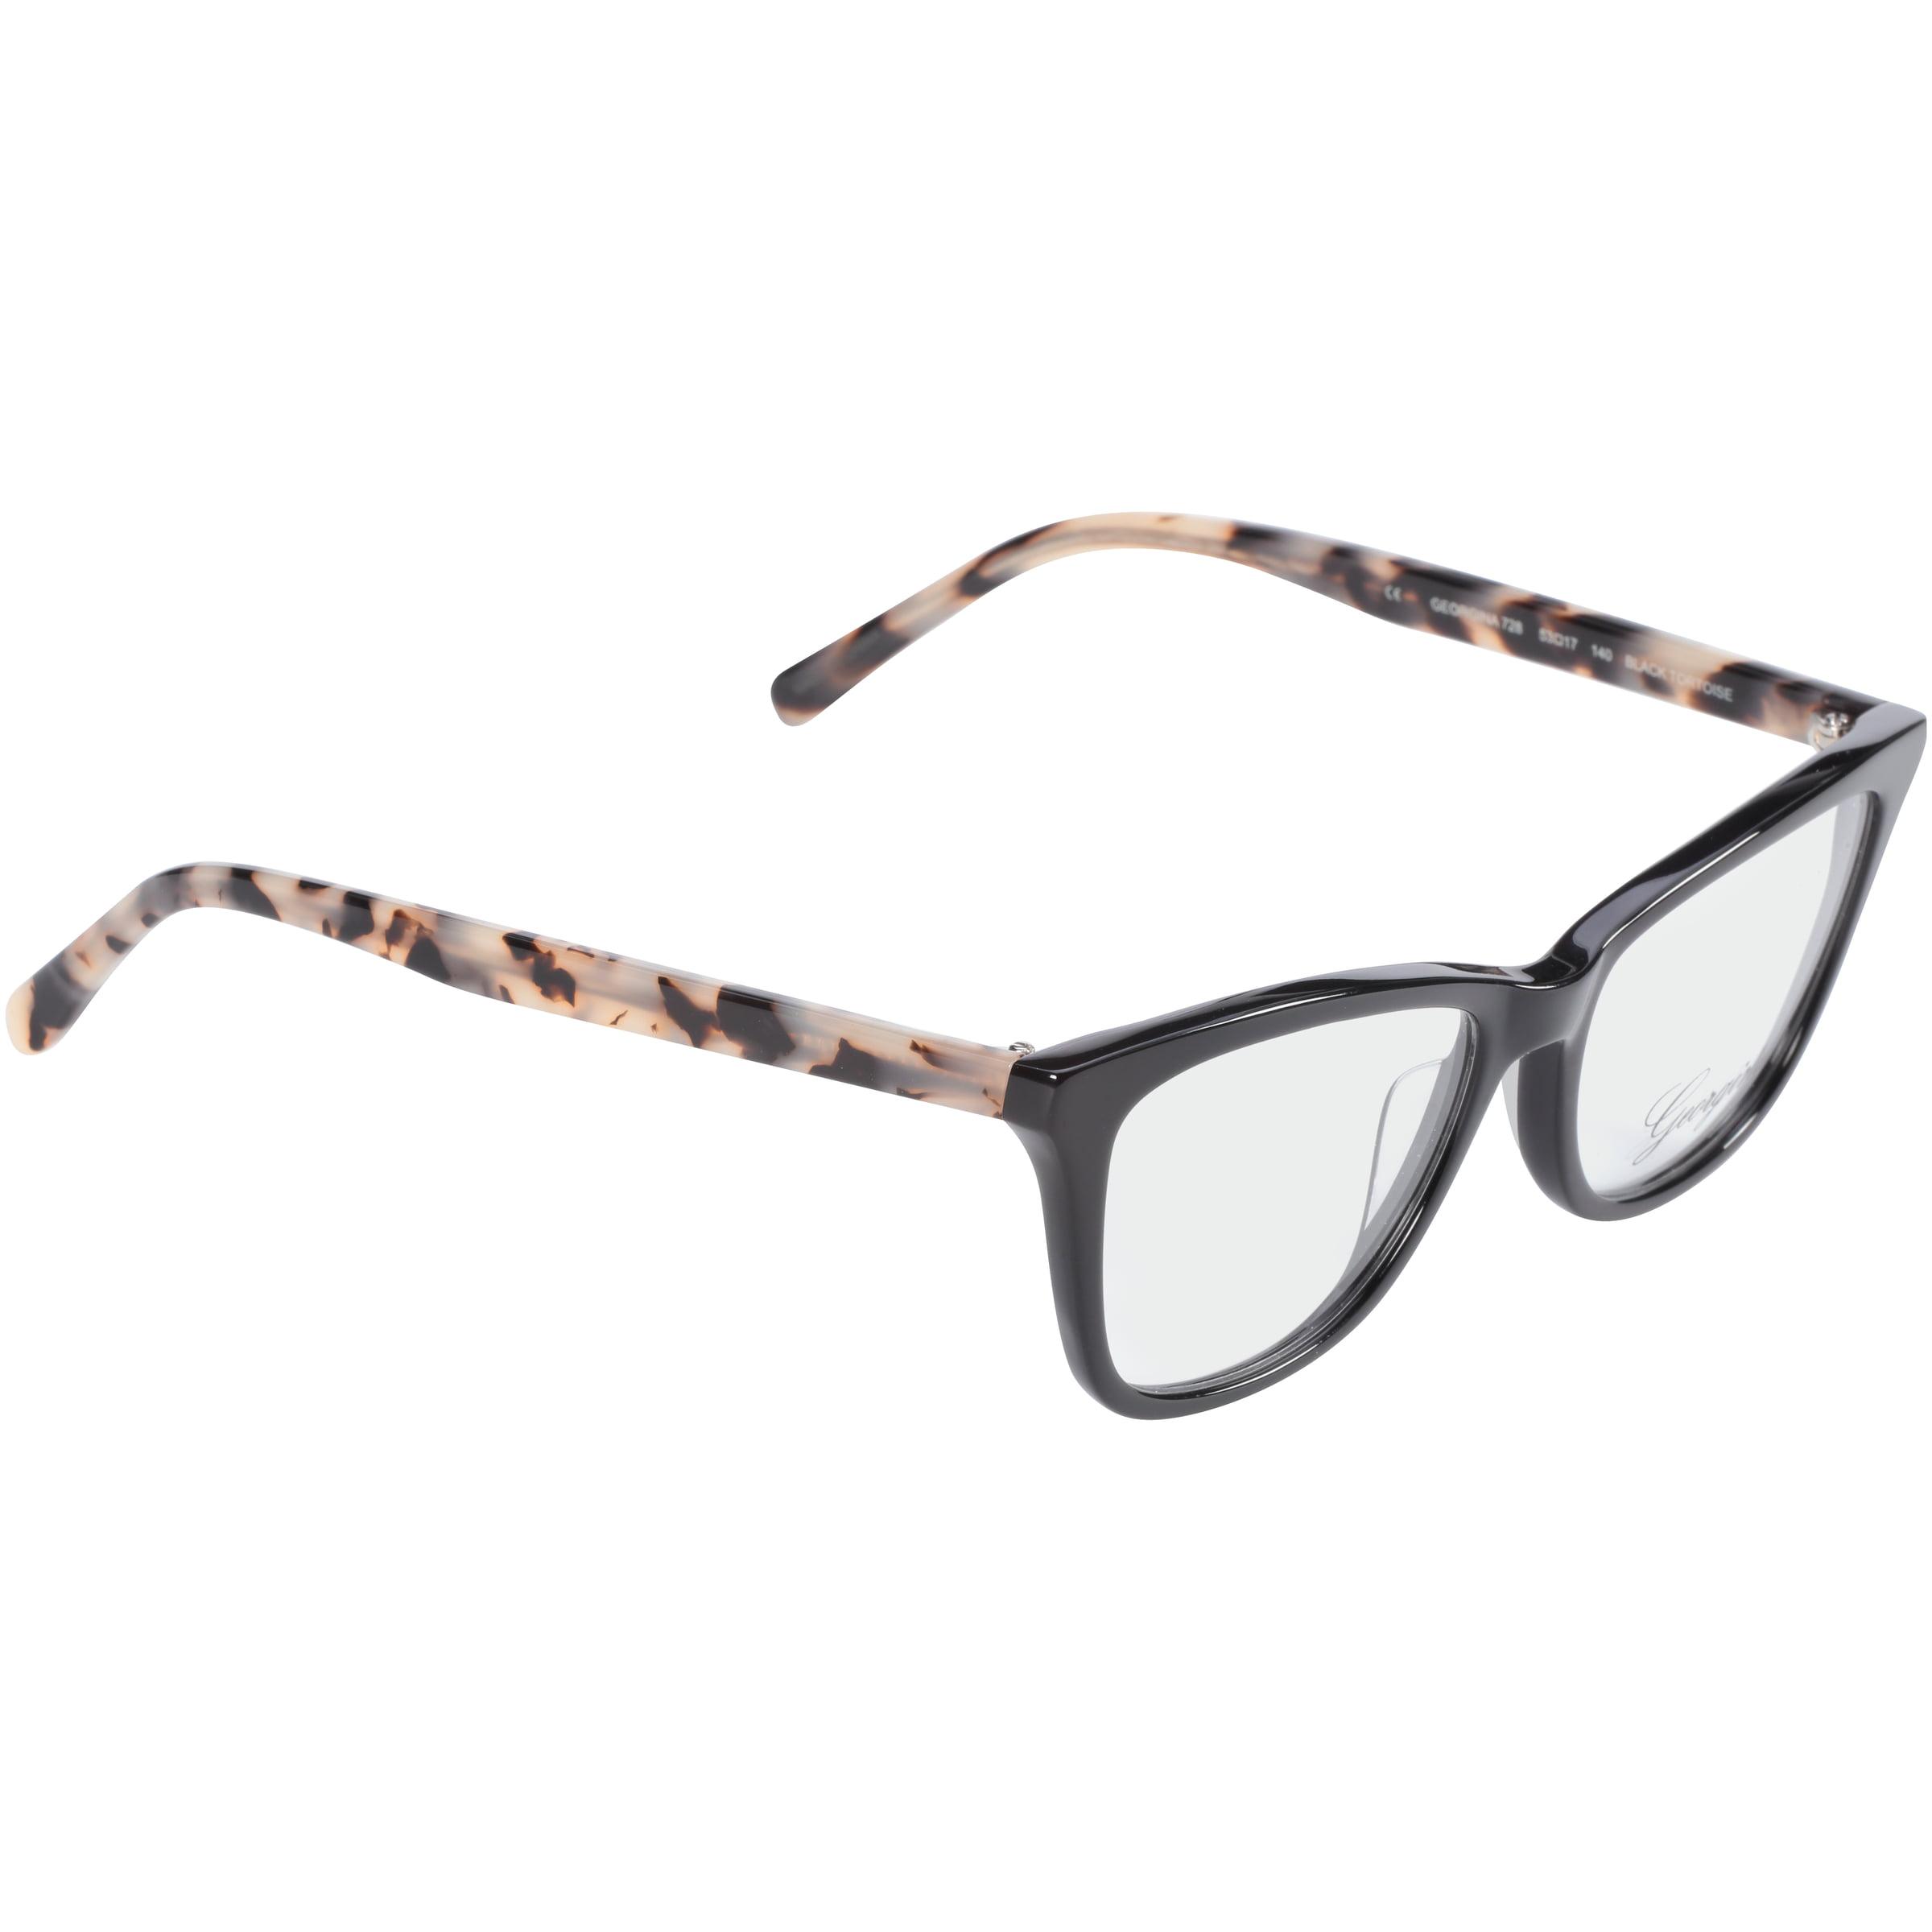 b21d7d39cbb3 Georgina Eyewear Rx-able Eyeglass Frames 728 Black Tortoise - Walmart.com